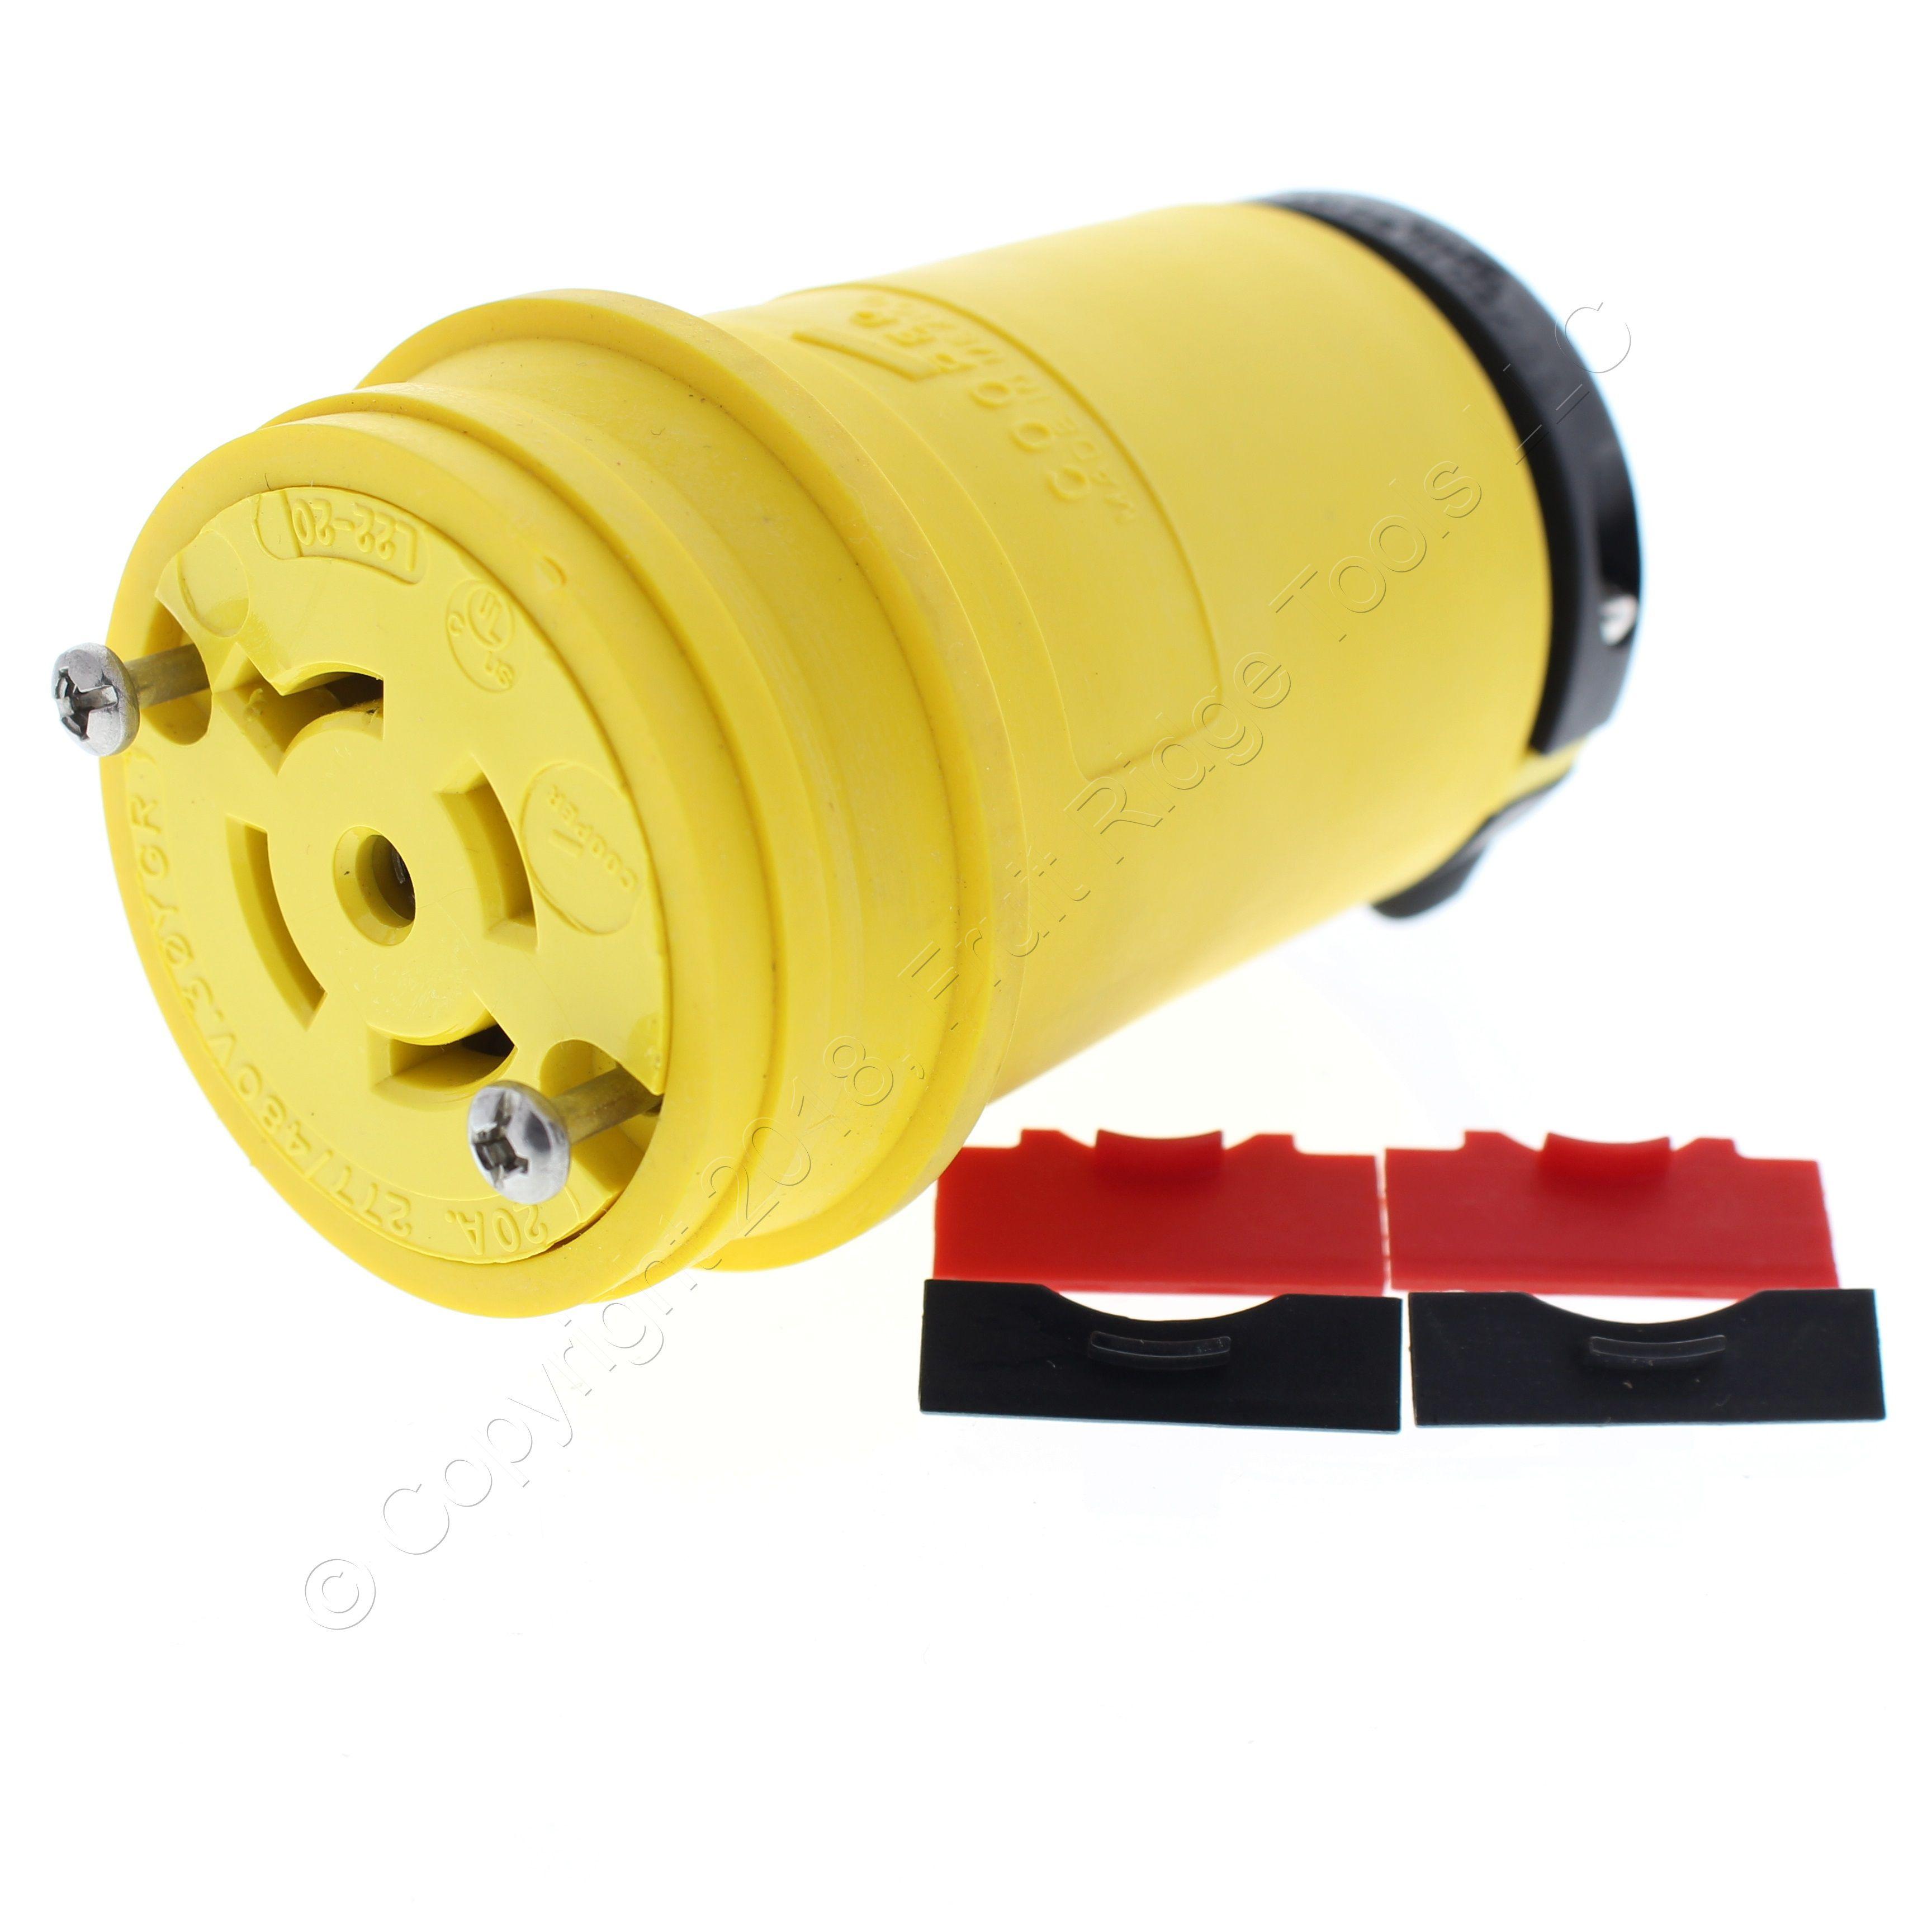 Cooper Black Watertight Back Wire Locking Plug L14-30P 30A 125 250V 3P4W L1430PW